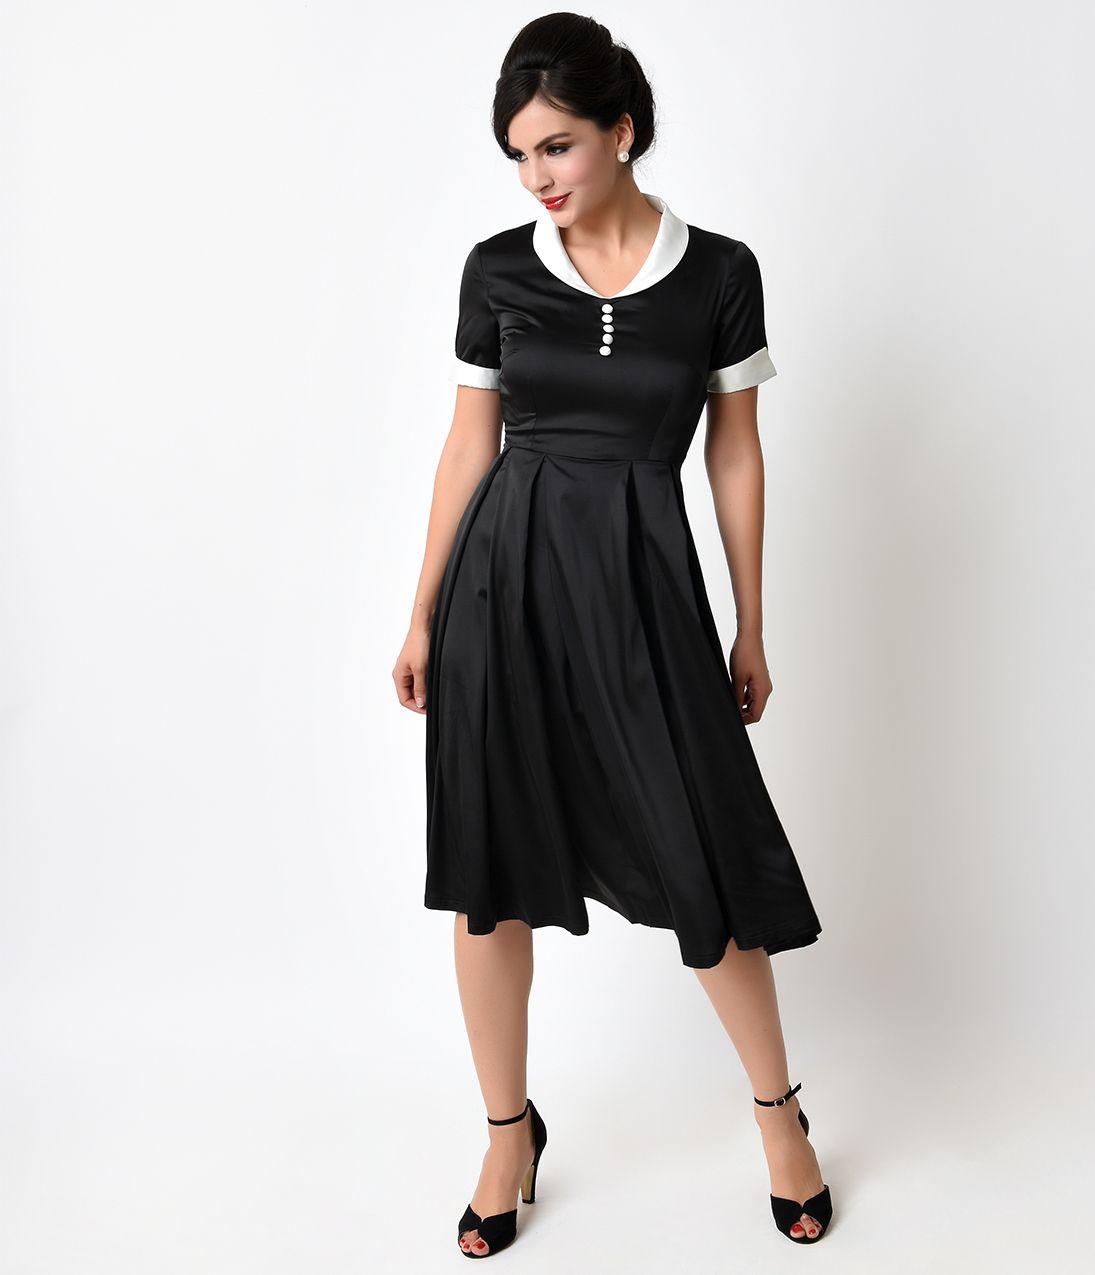 1950s Swing Dresses 50s Swing Dress Satin Swing Dress 1950s Fashion Dresses Unique Dresses [ 1275 x 1095 Pixel ]